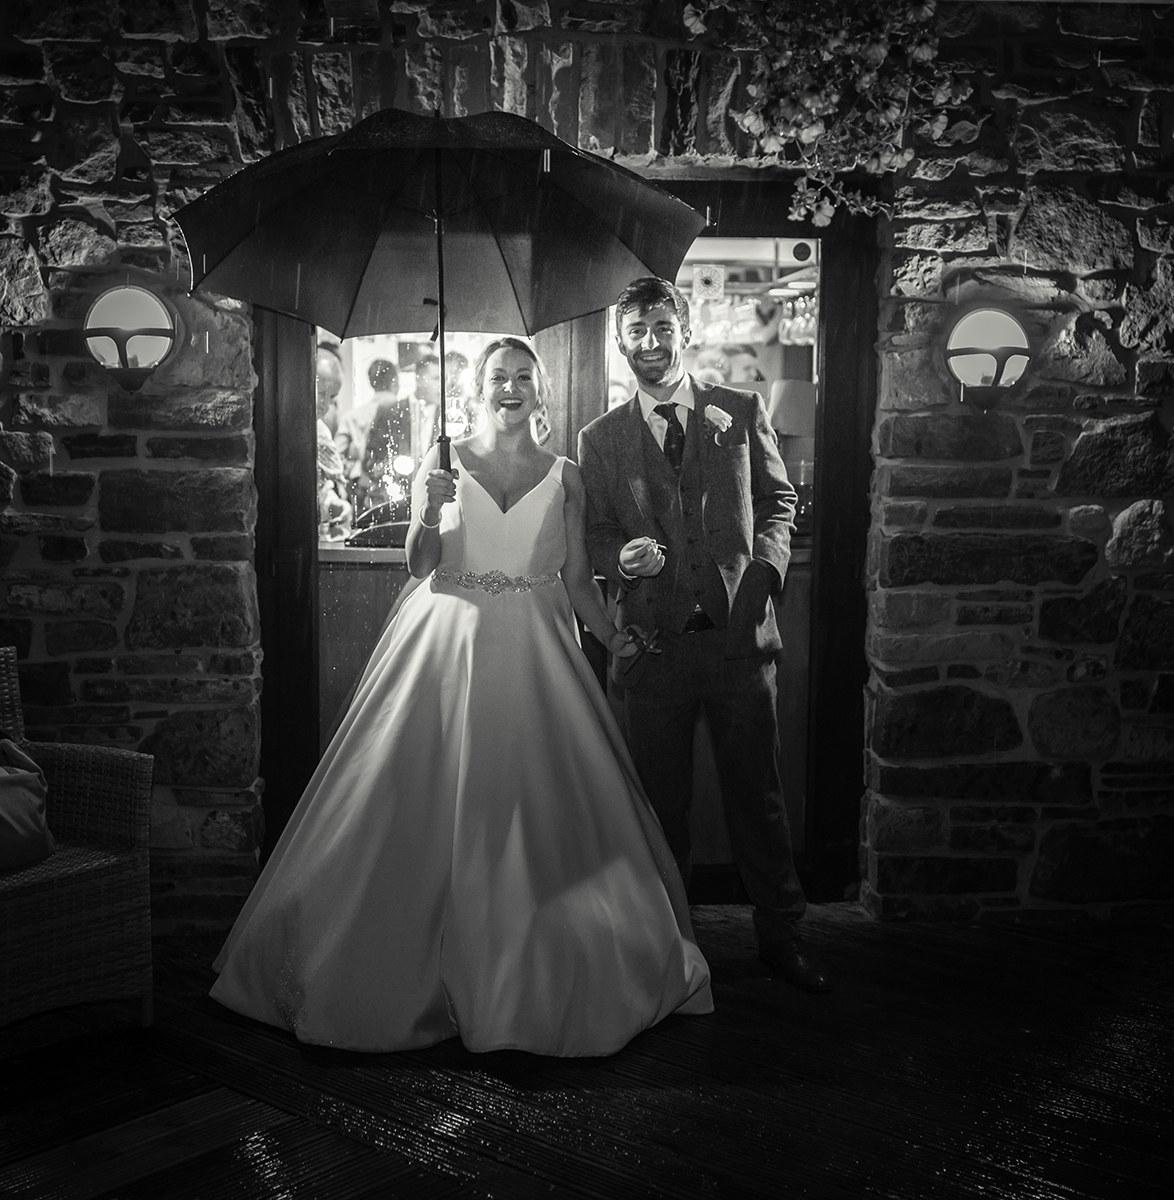 Bride and groom in the rain under an umbrella smoking a cigar